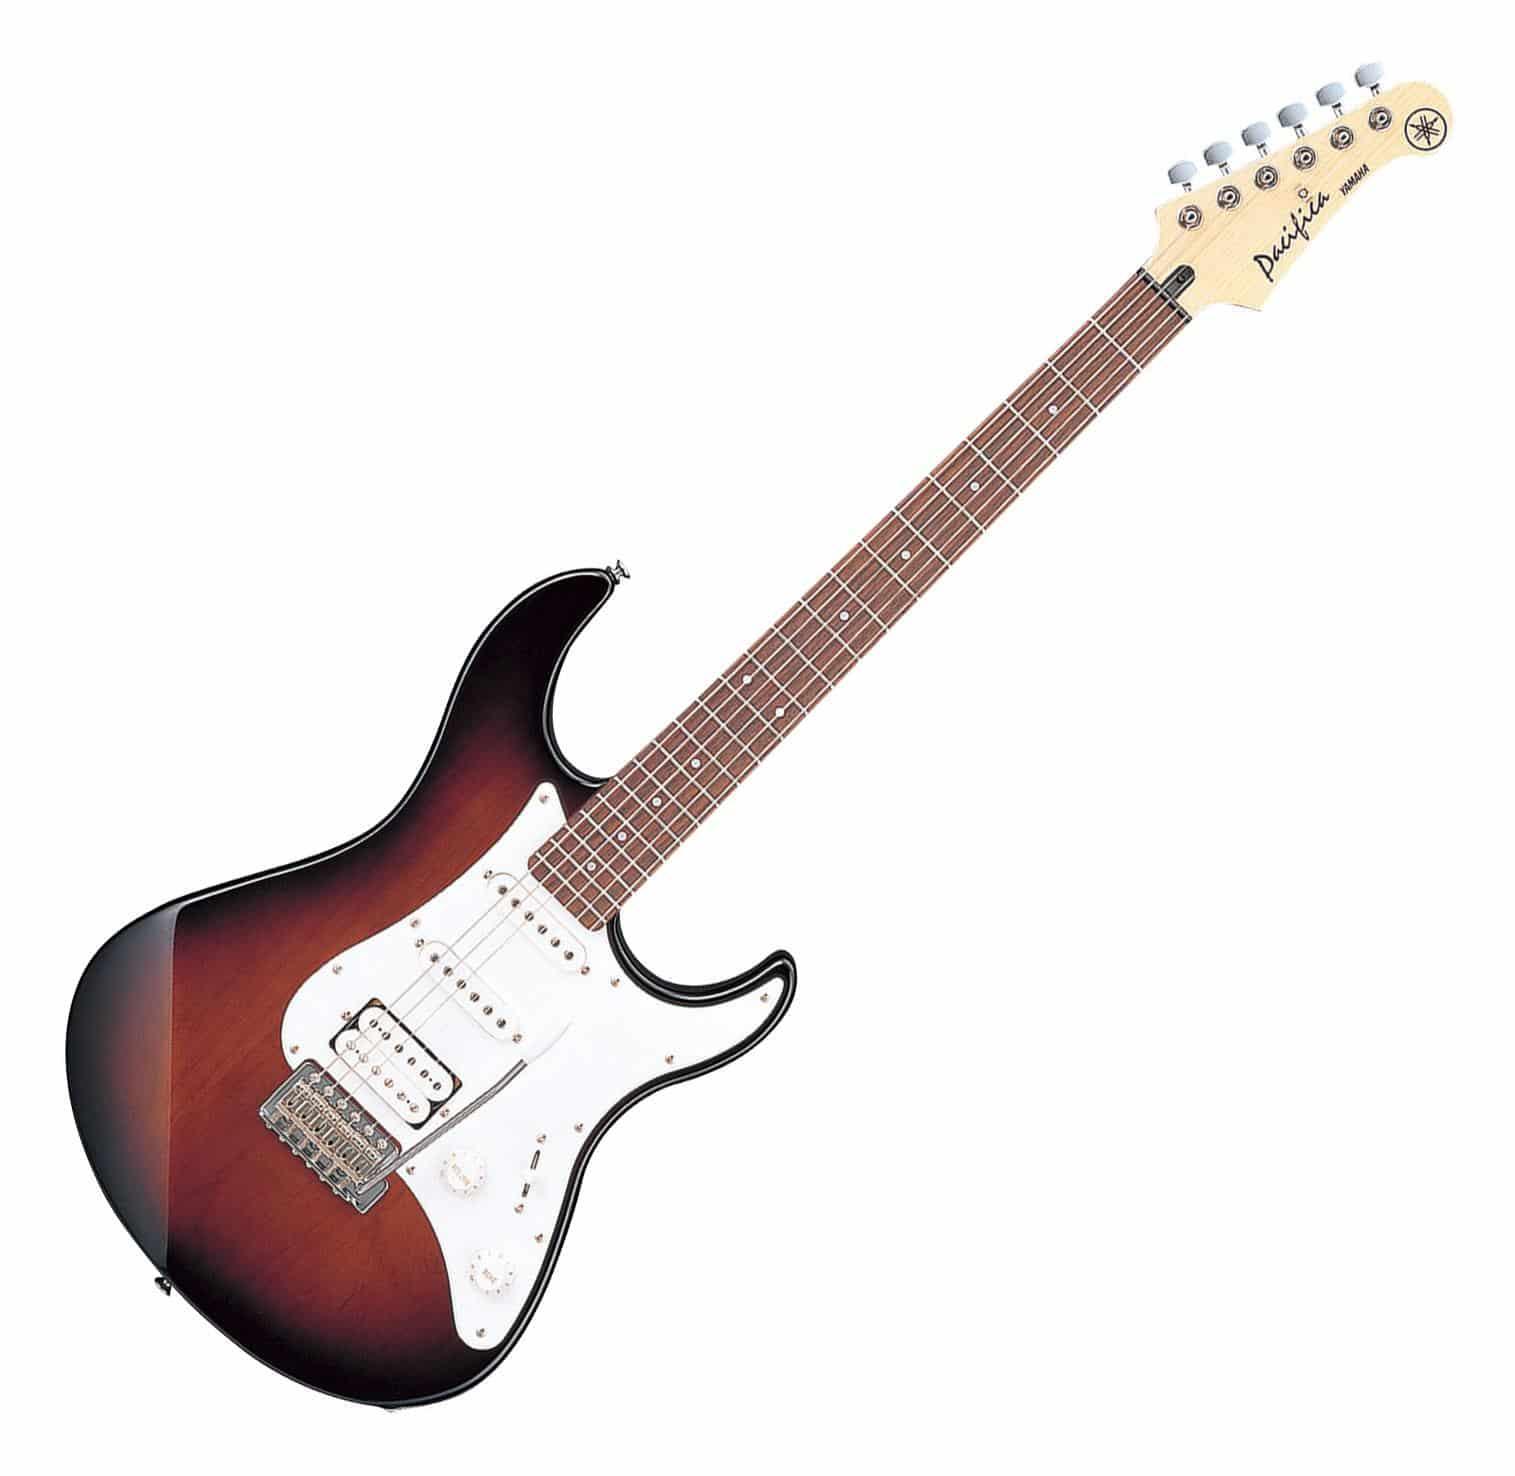 Yamaha Pacifica 112 E Gitarre (Old Violin Sunburst)